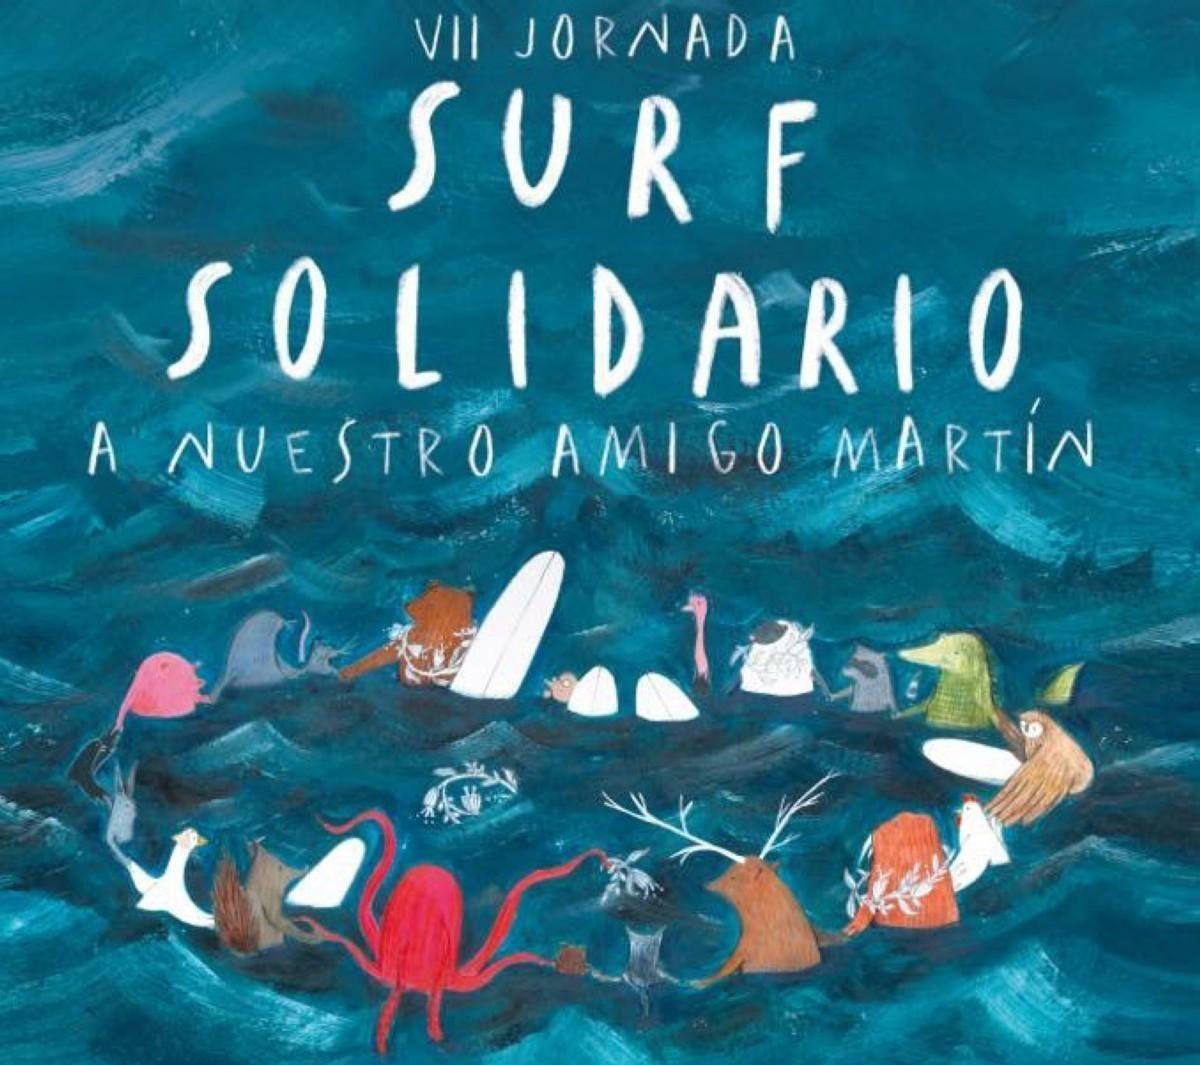 Surf Solidario vuelve a Gijón en su séptima edición